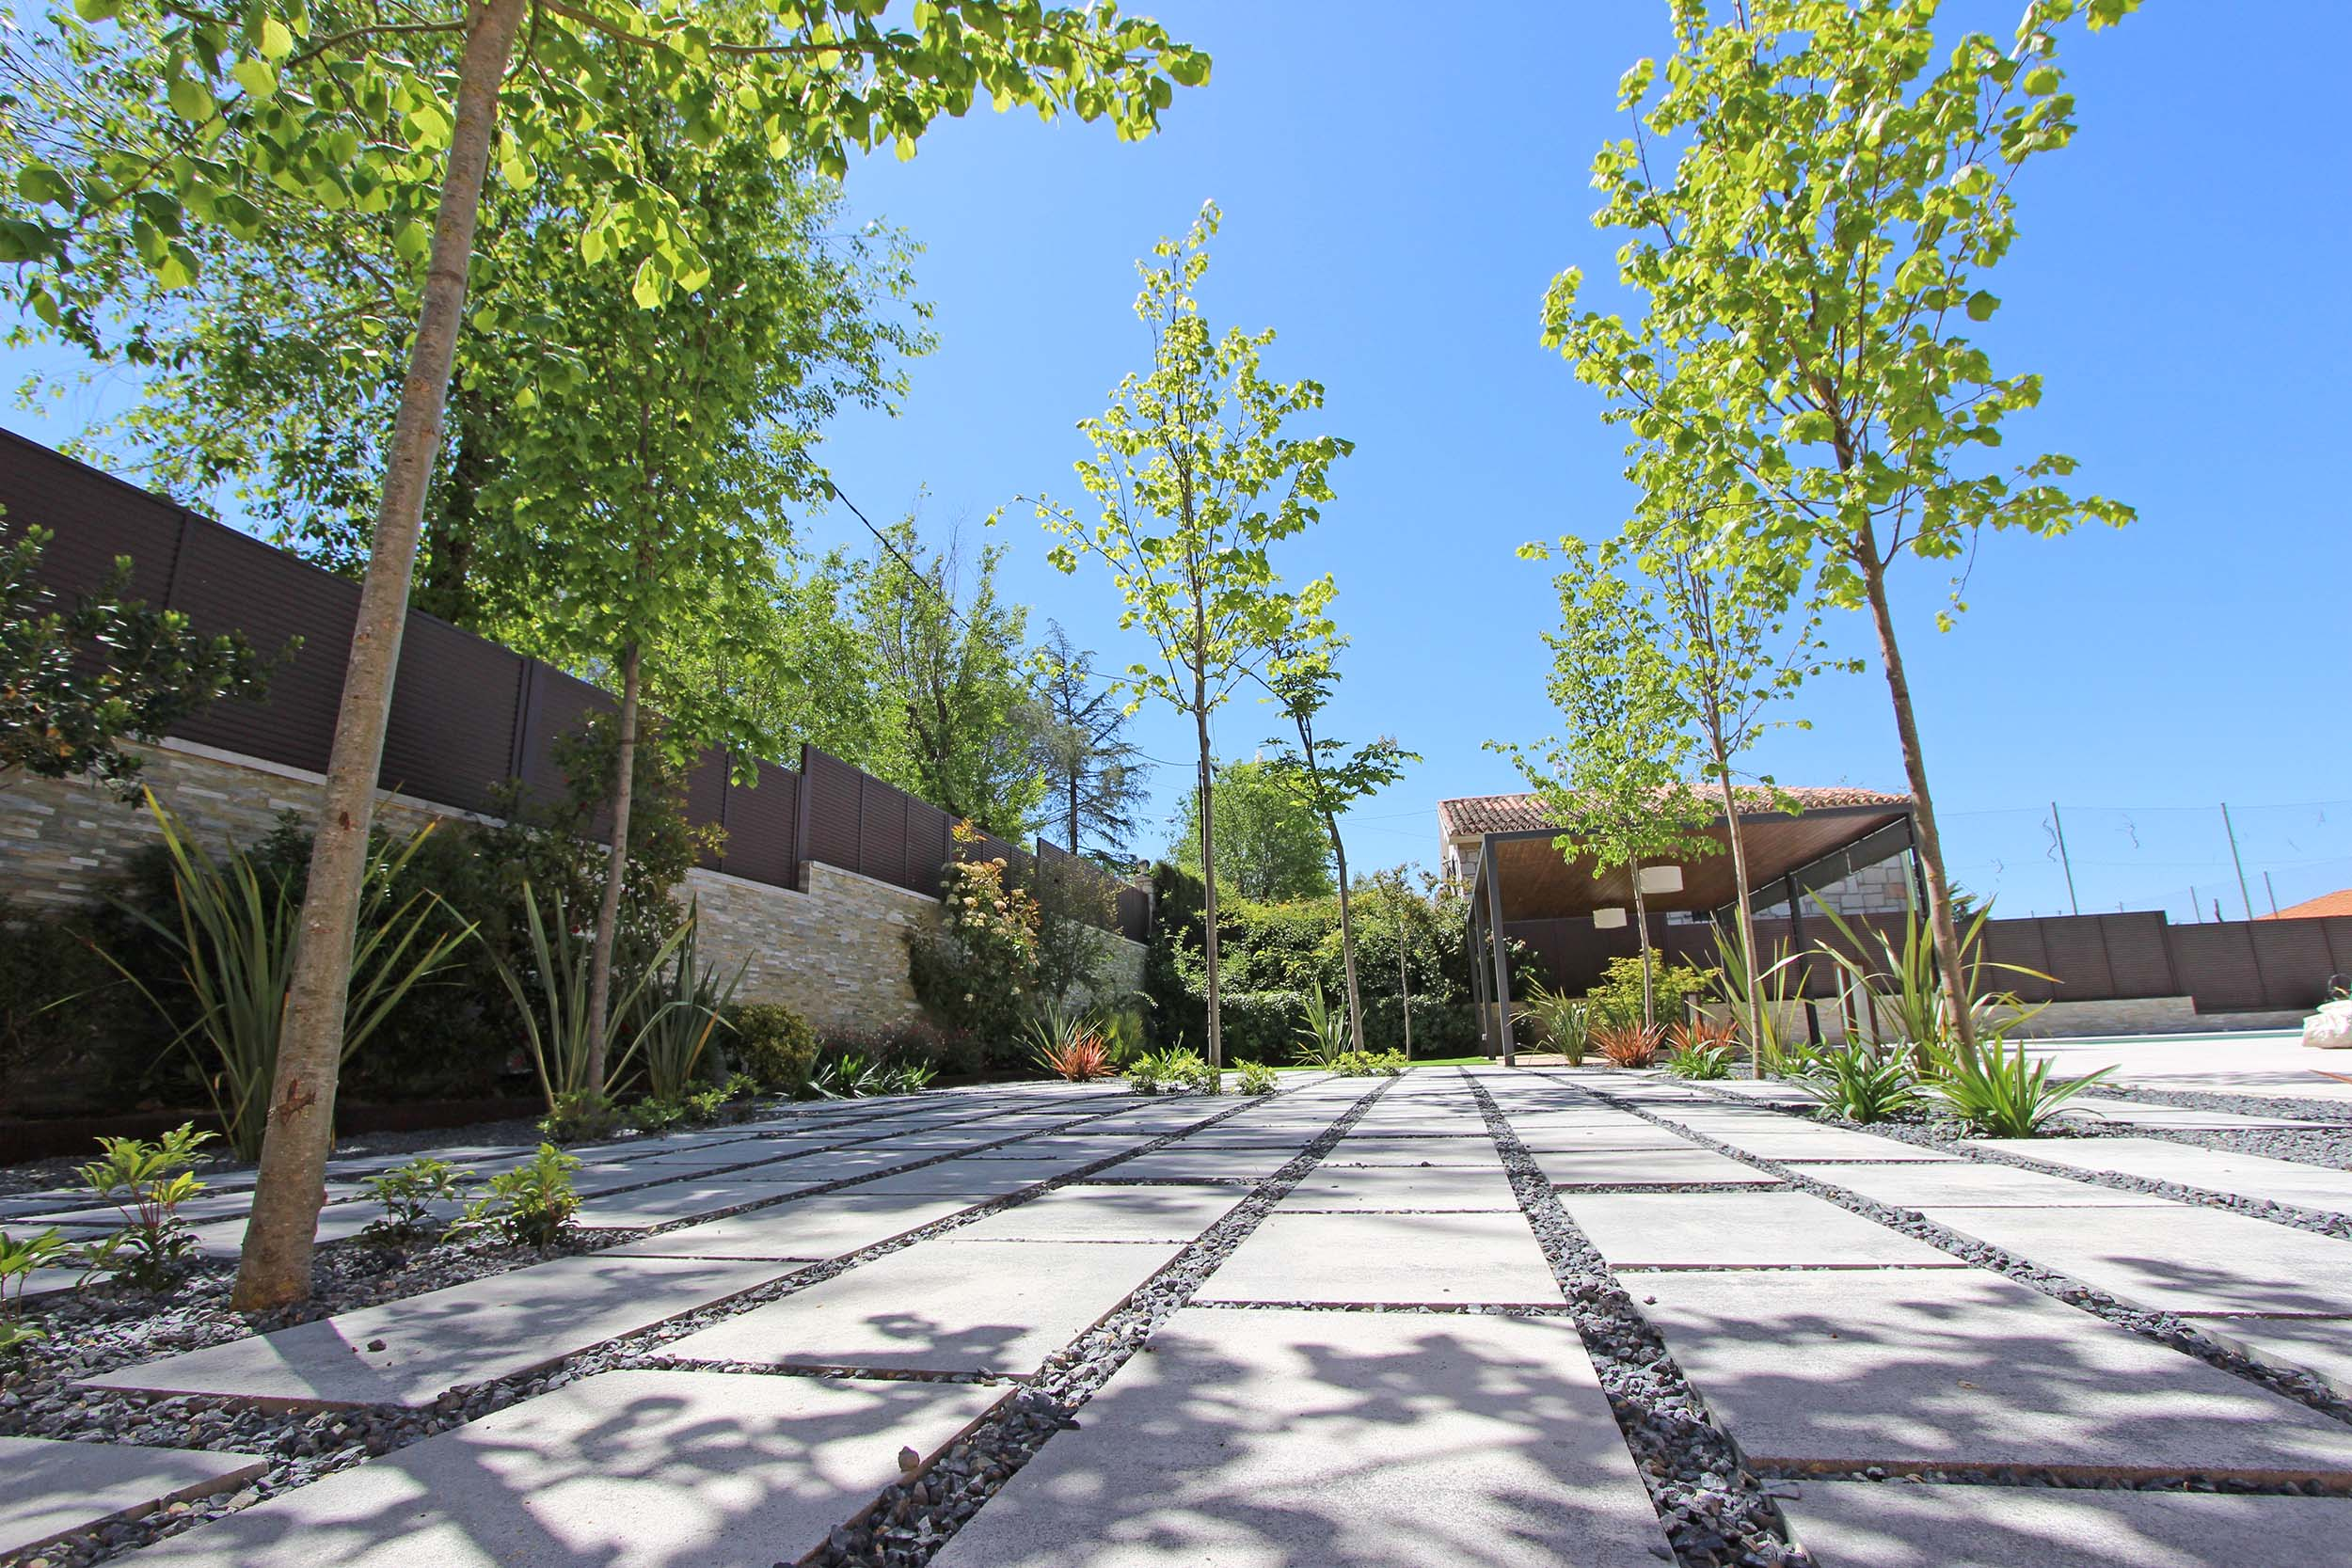 Pool House - Salón de Jardín